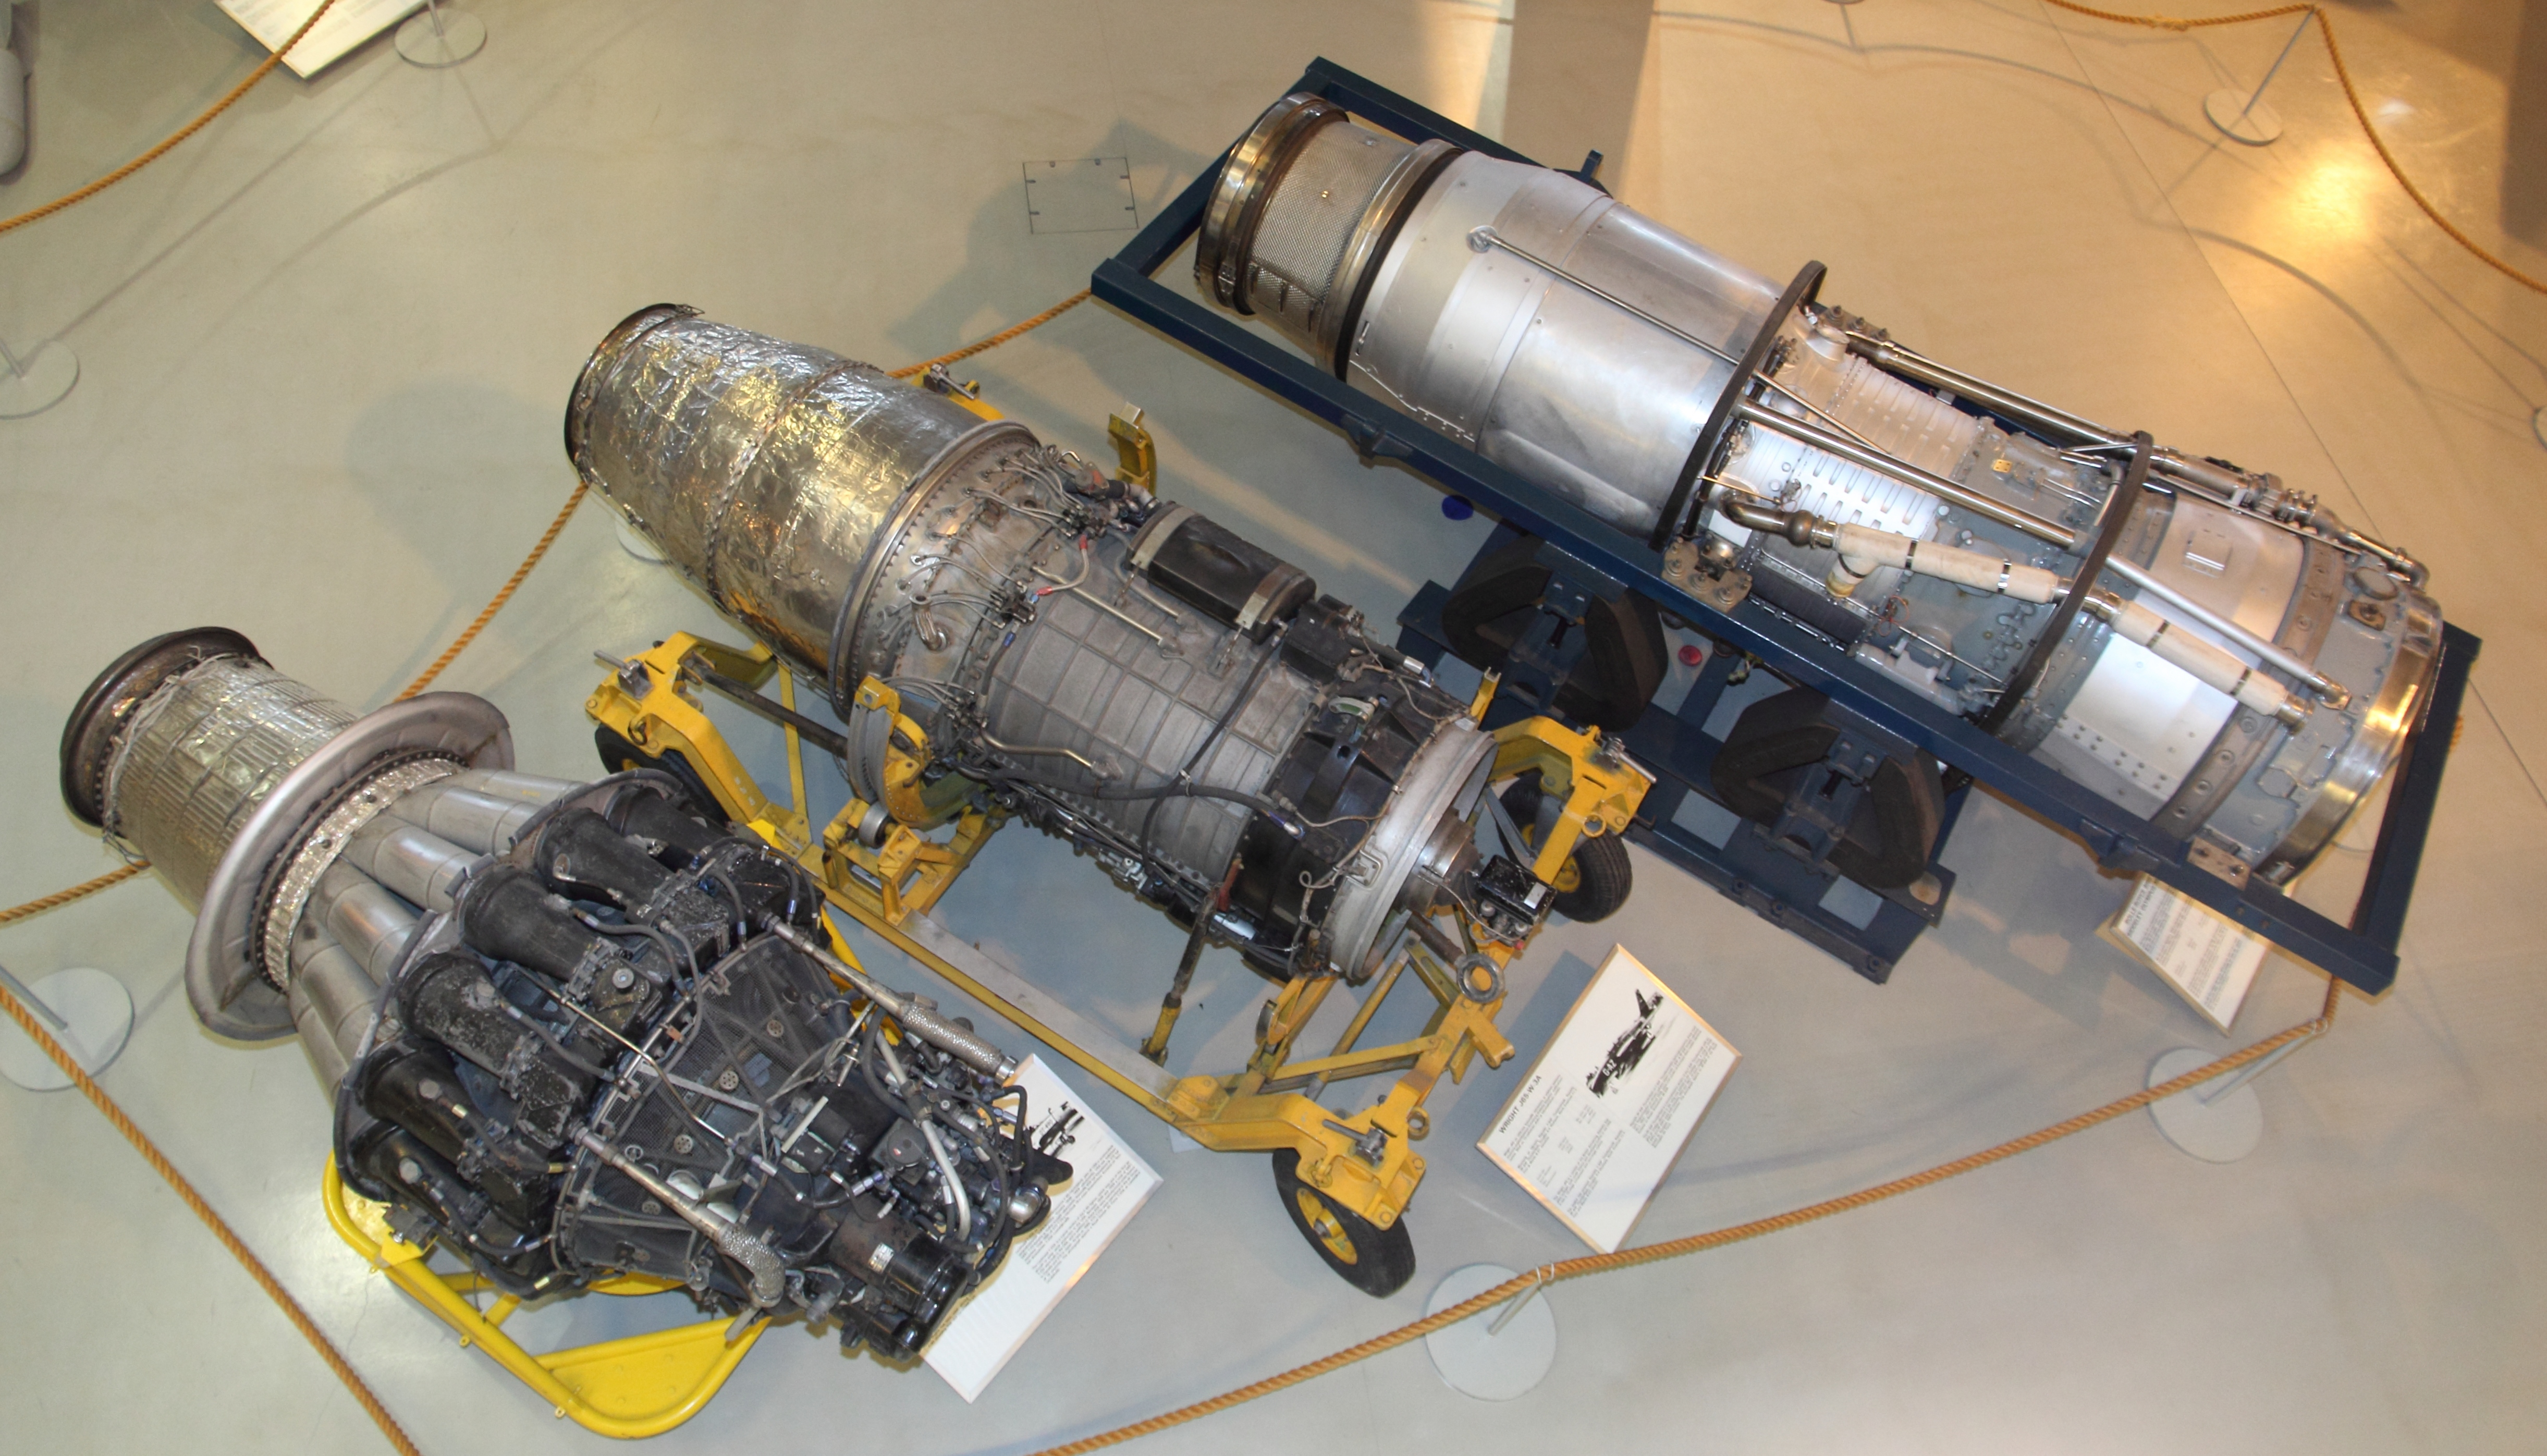 besides Tumblr M Hr Alzi Qk I Lo likewise P Bx Est as well Figurestudy besides T Porta. on j 33 jet engine